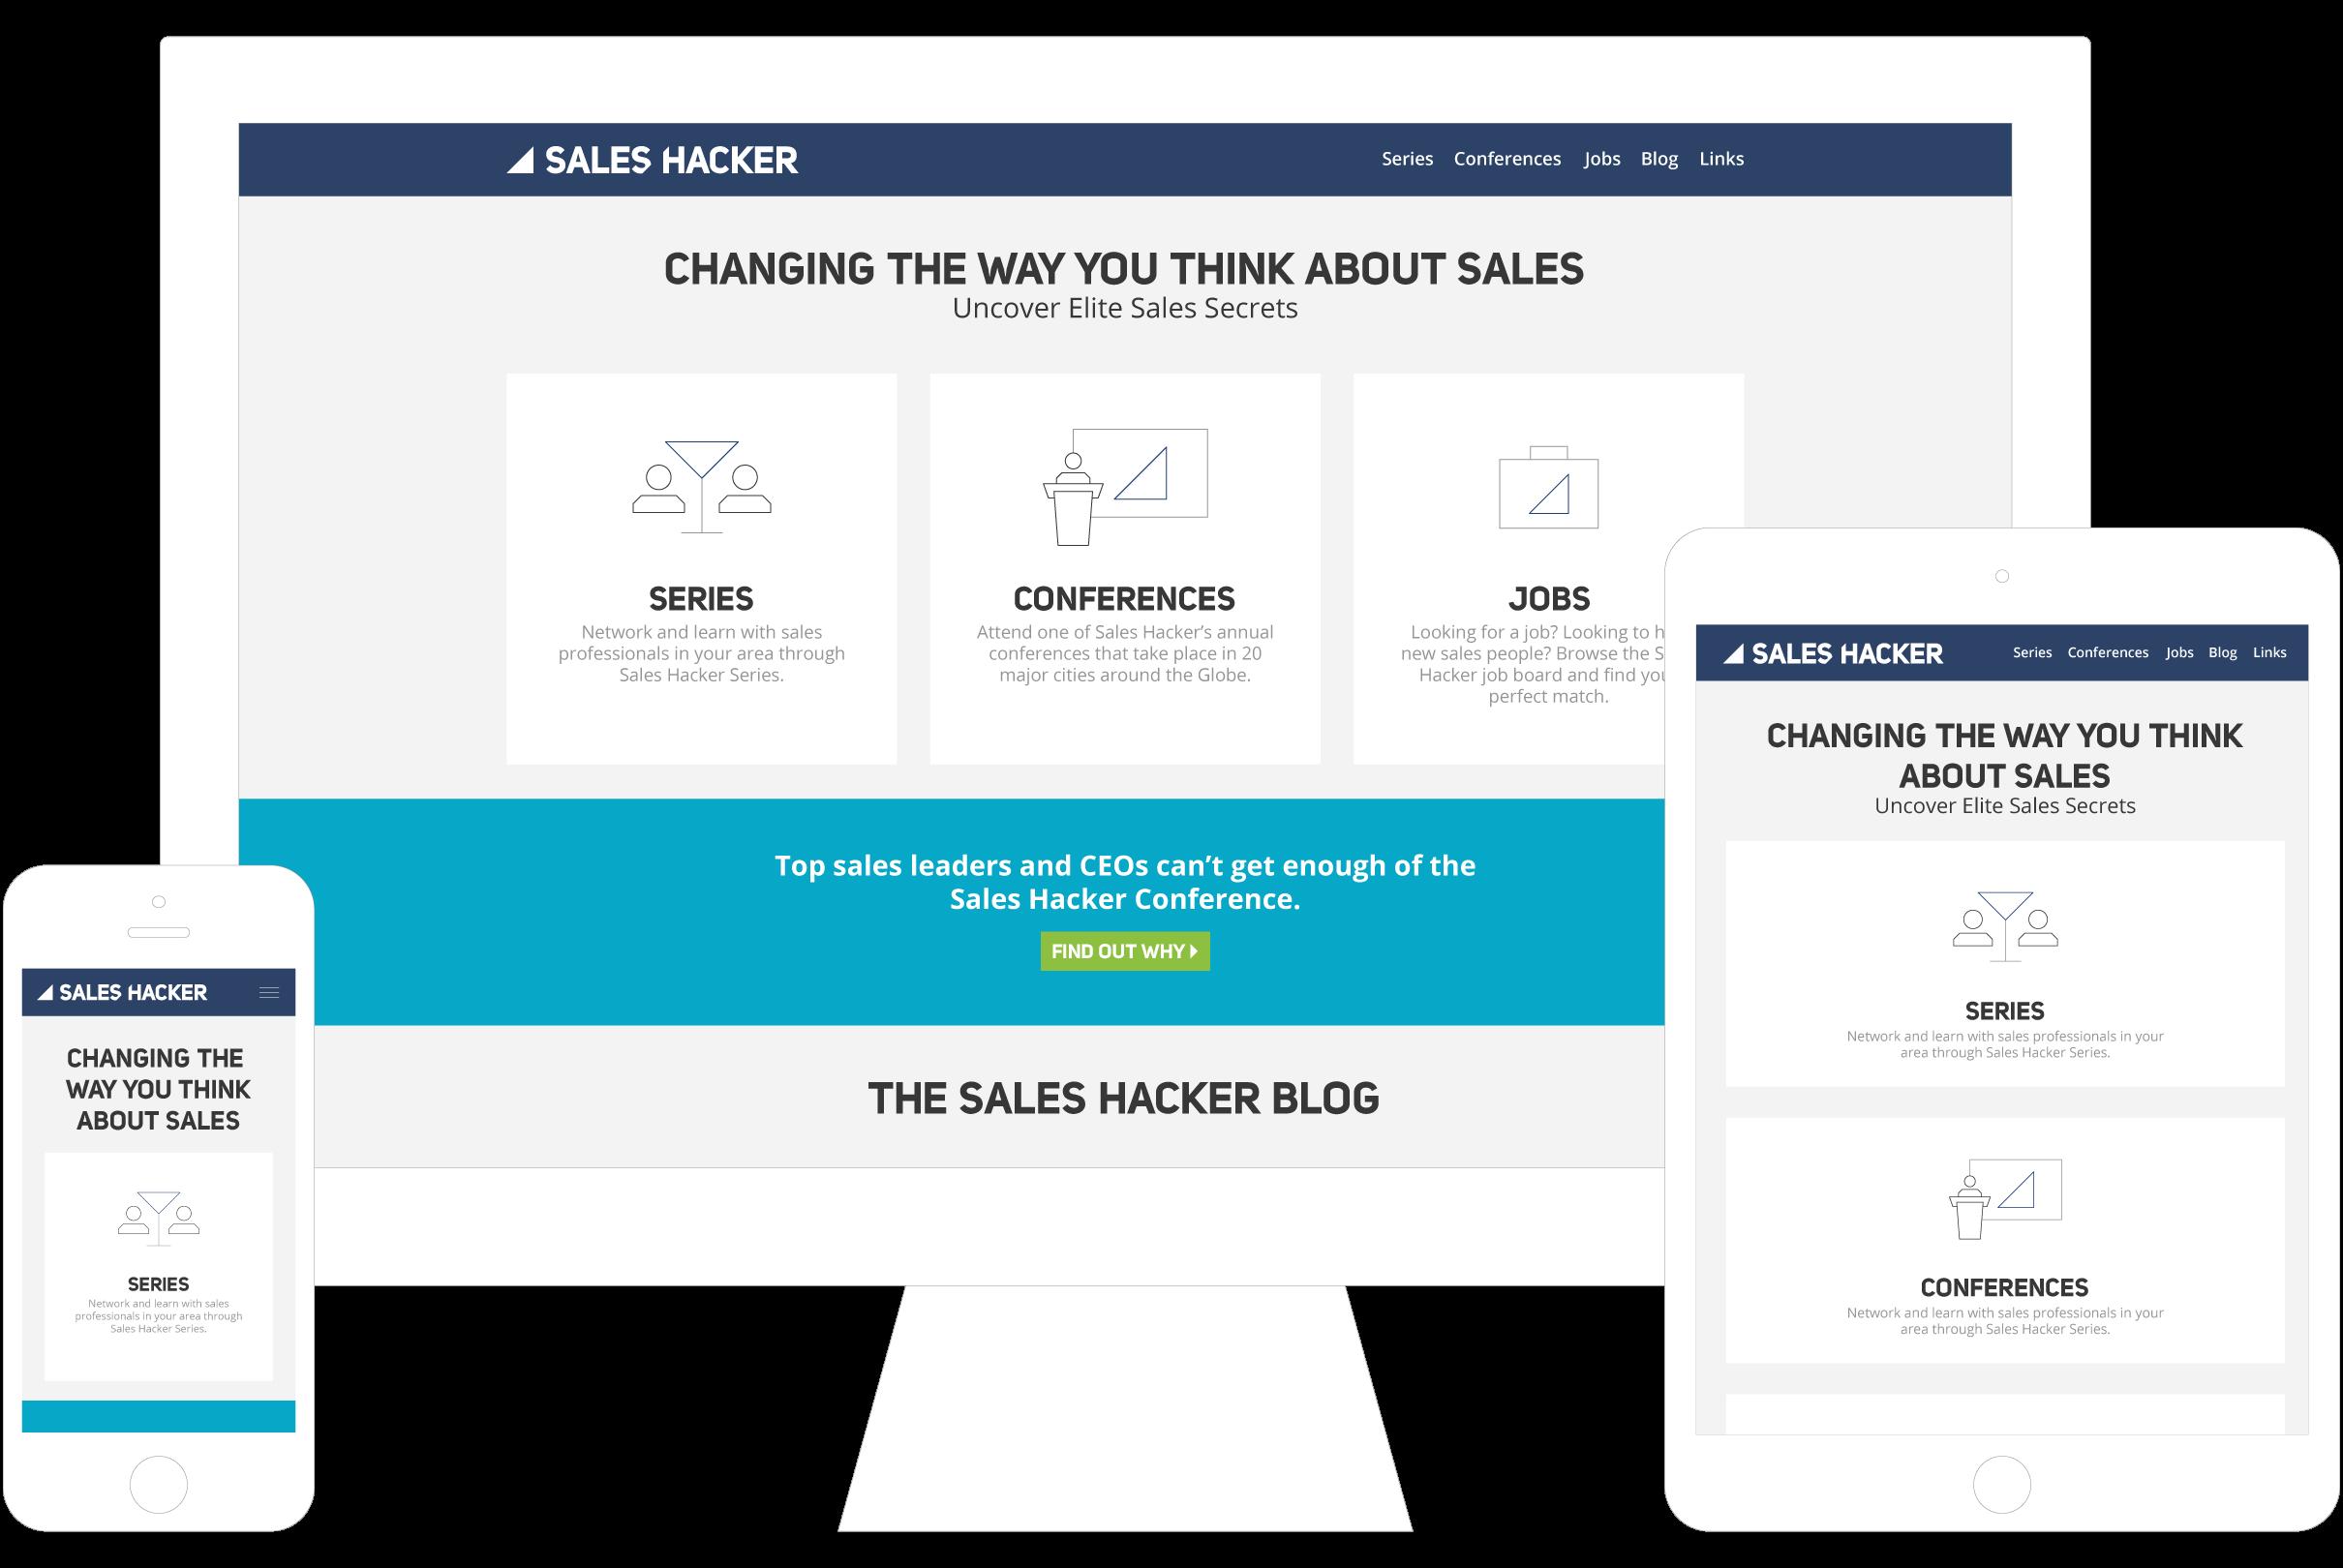 Case Study - Sales Hacker